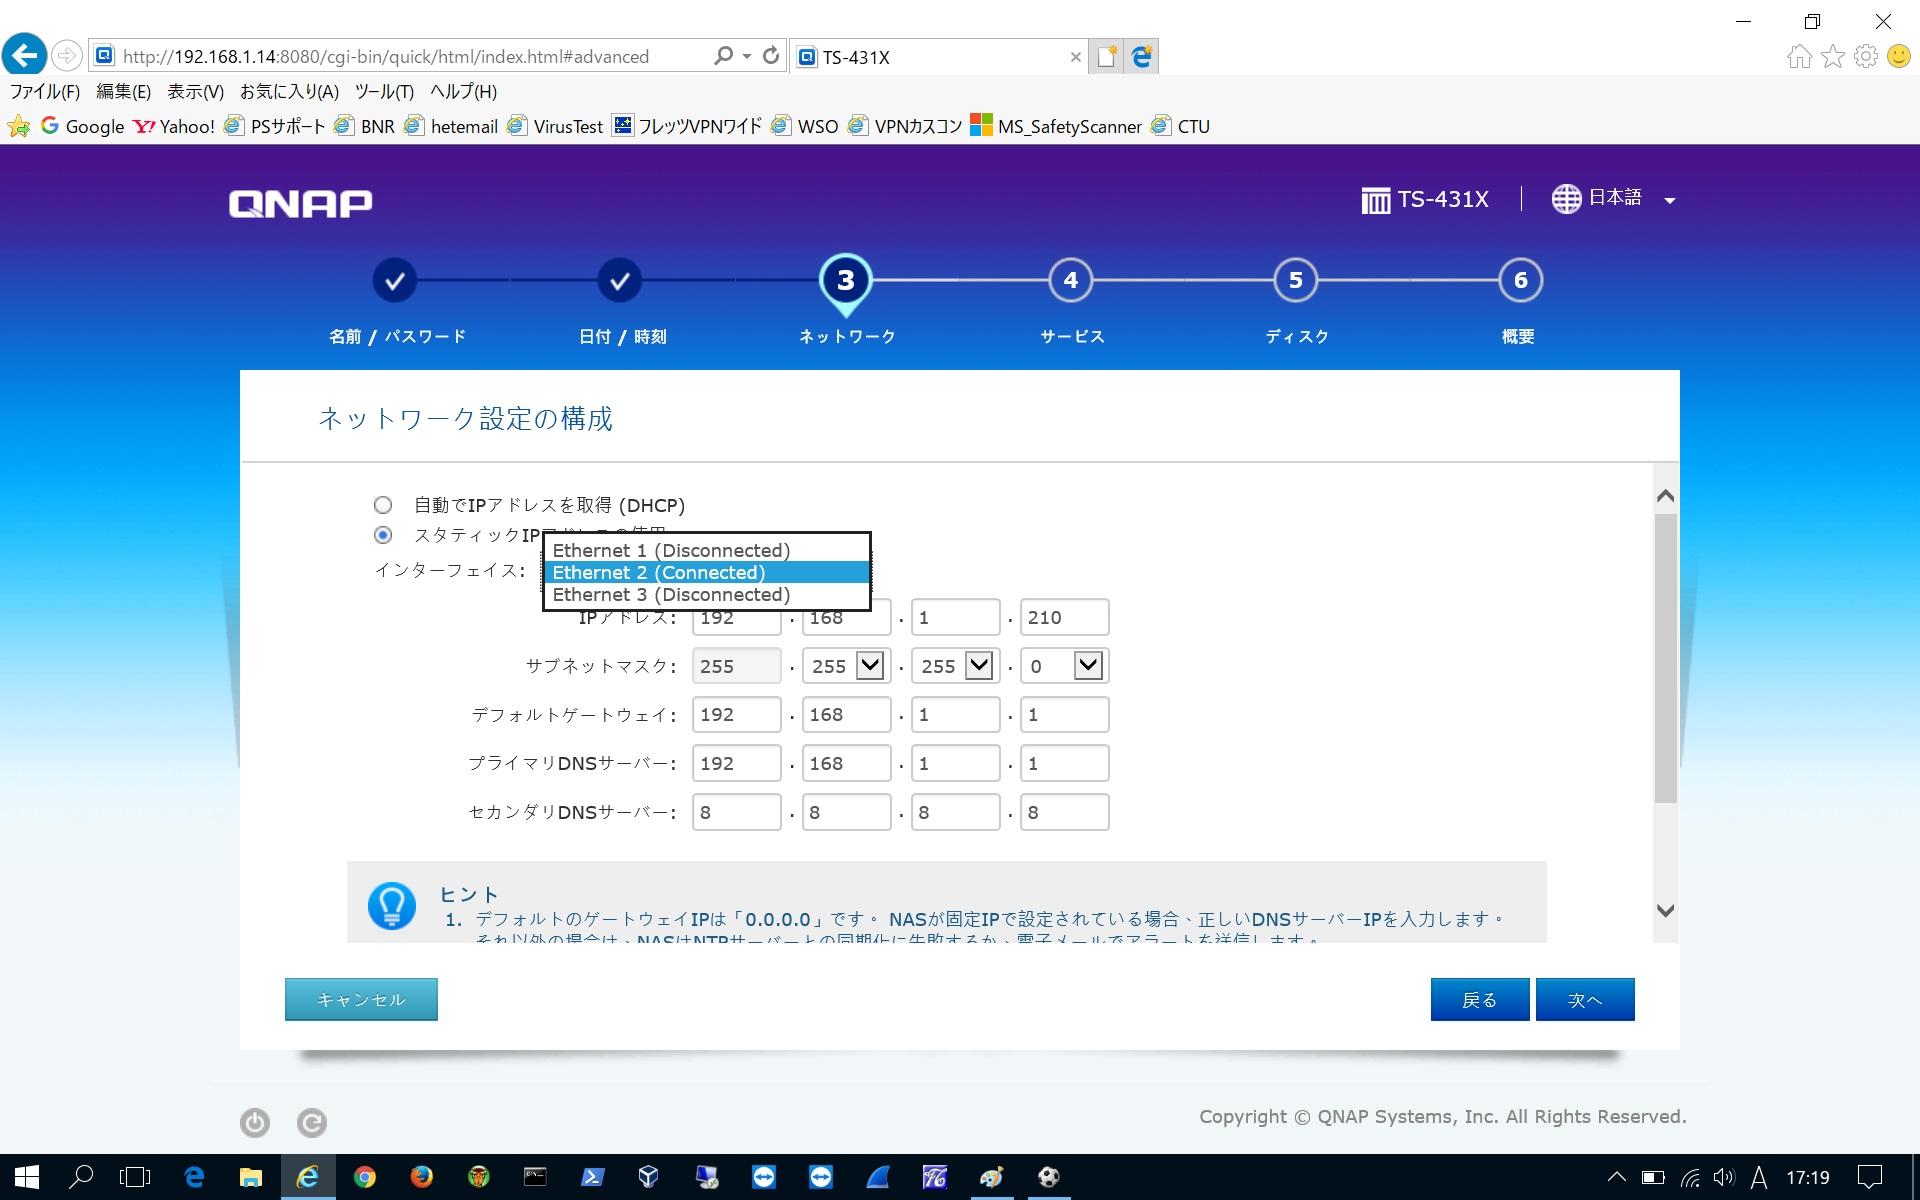 004 QNAP-NAS_install